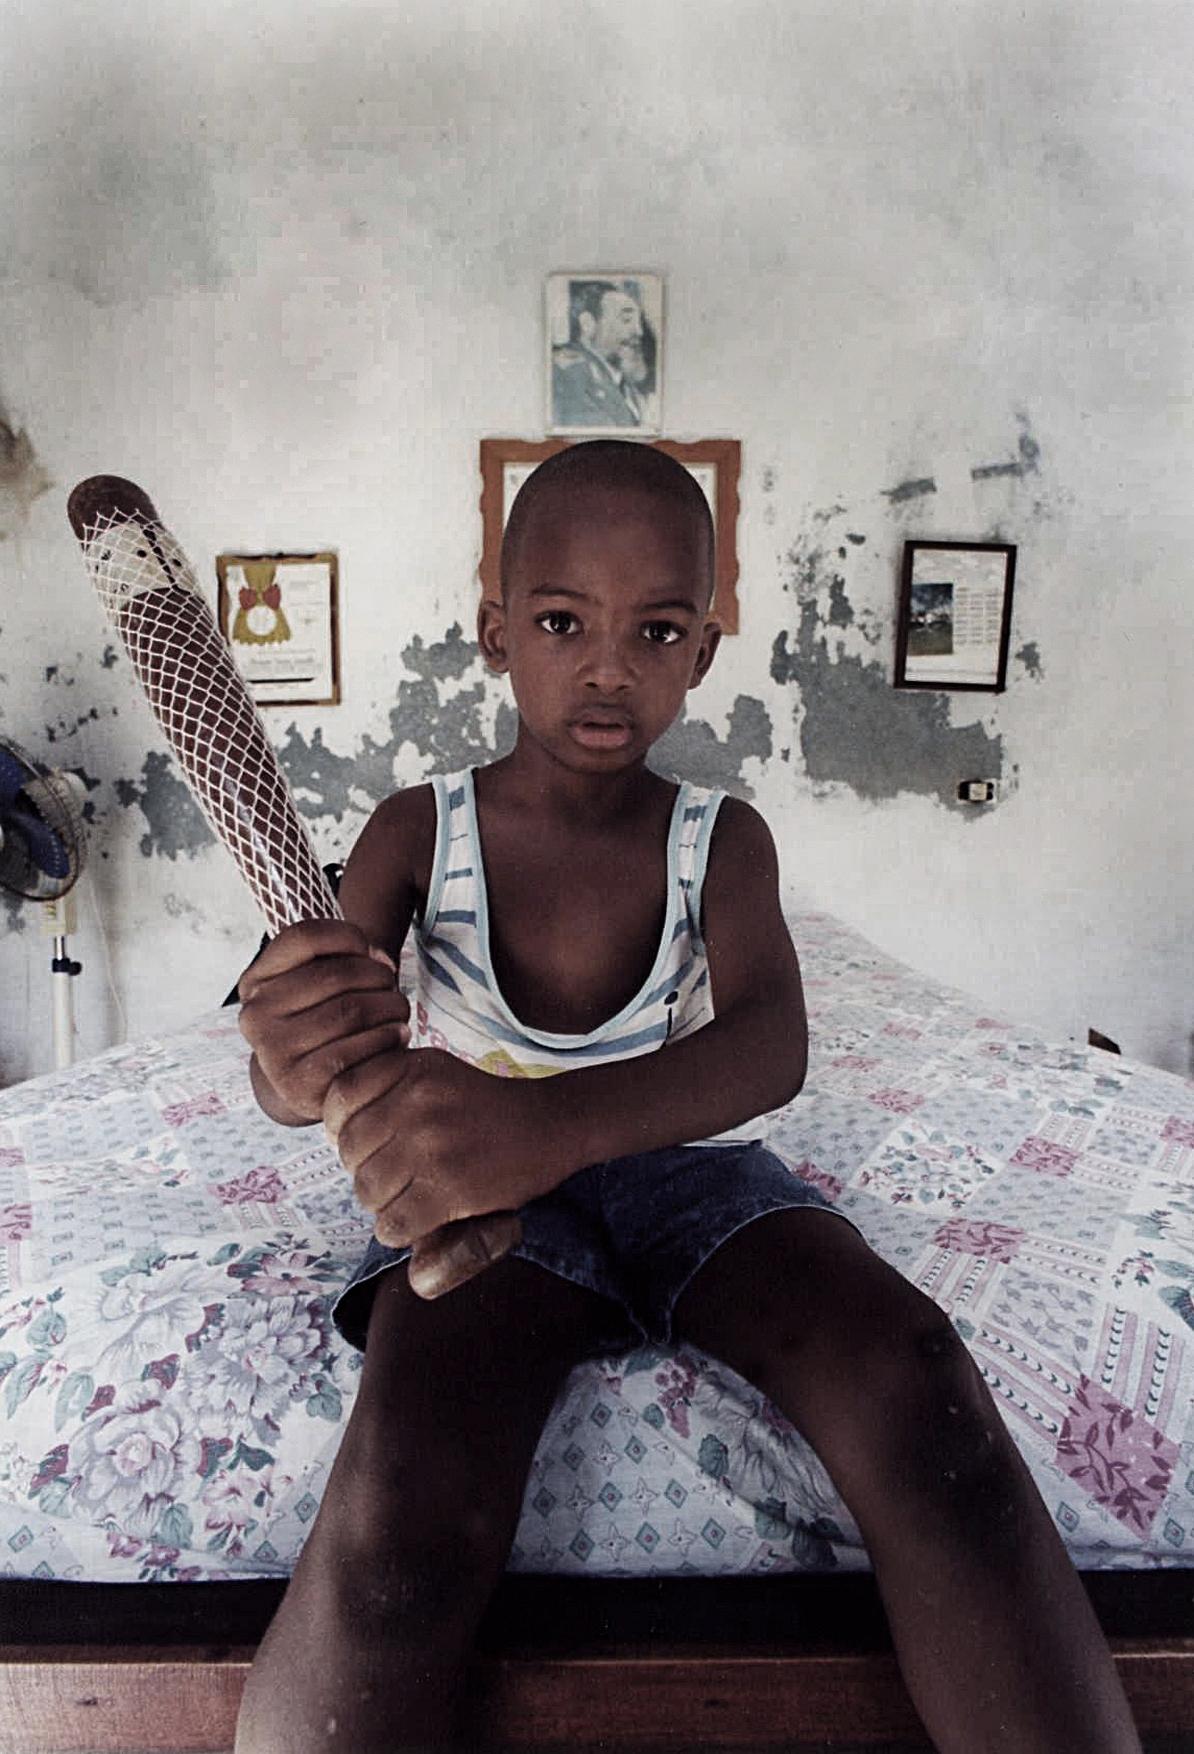 Cuba - Boy With Bat